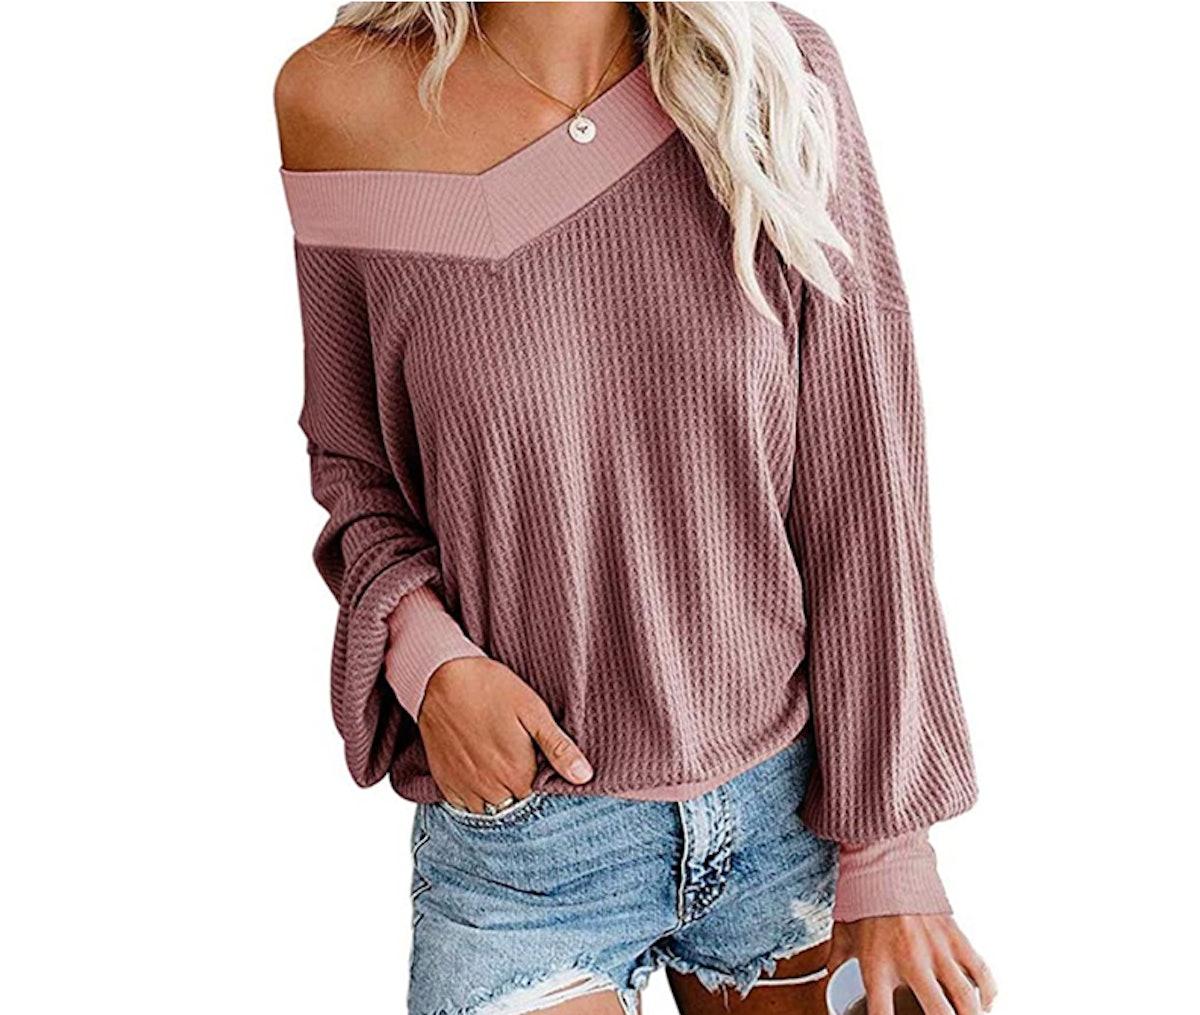 Tobrief Knit Sweater